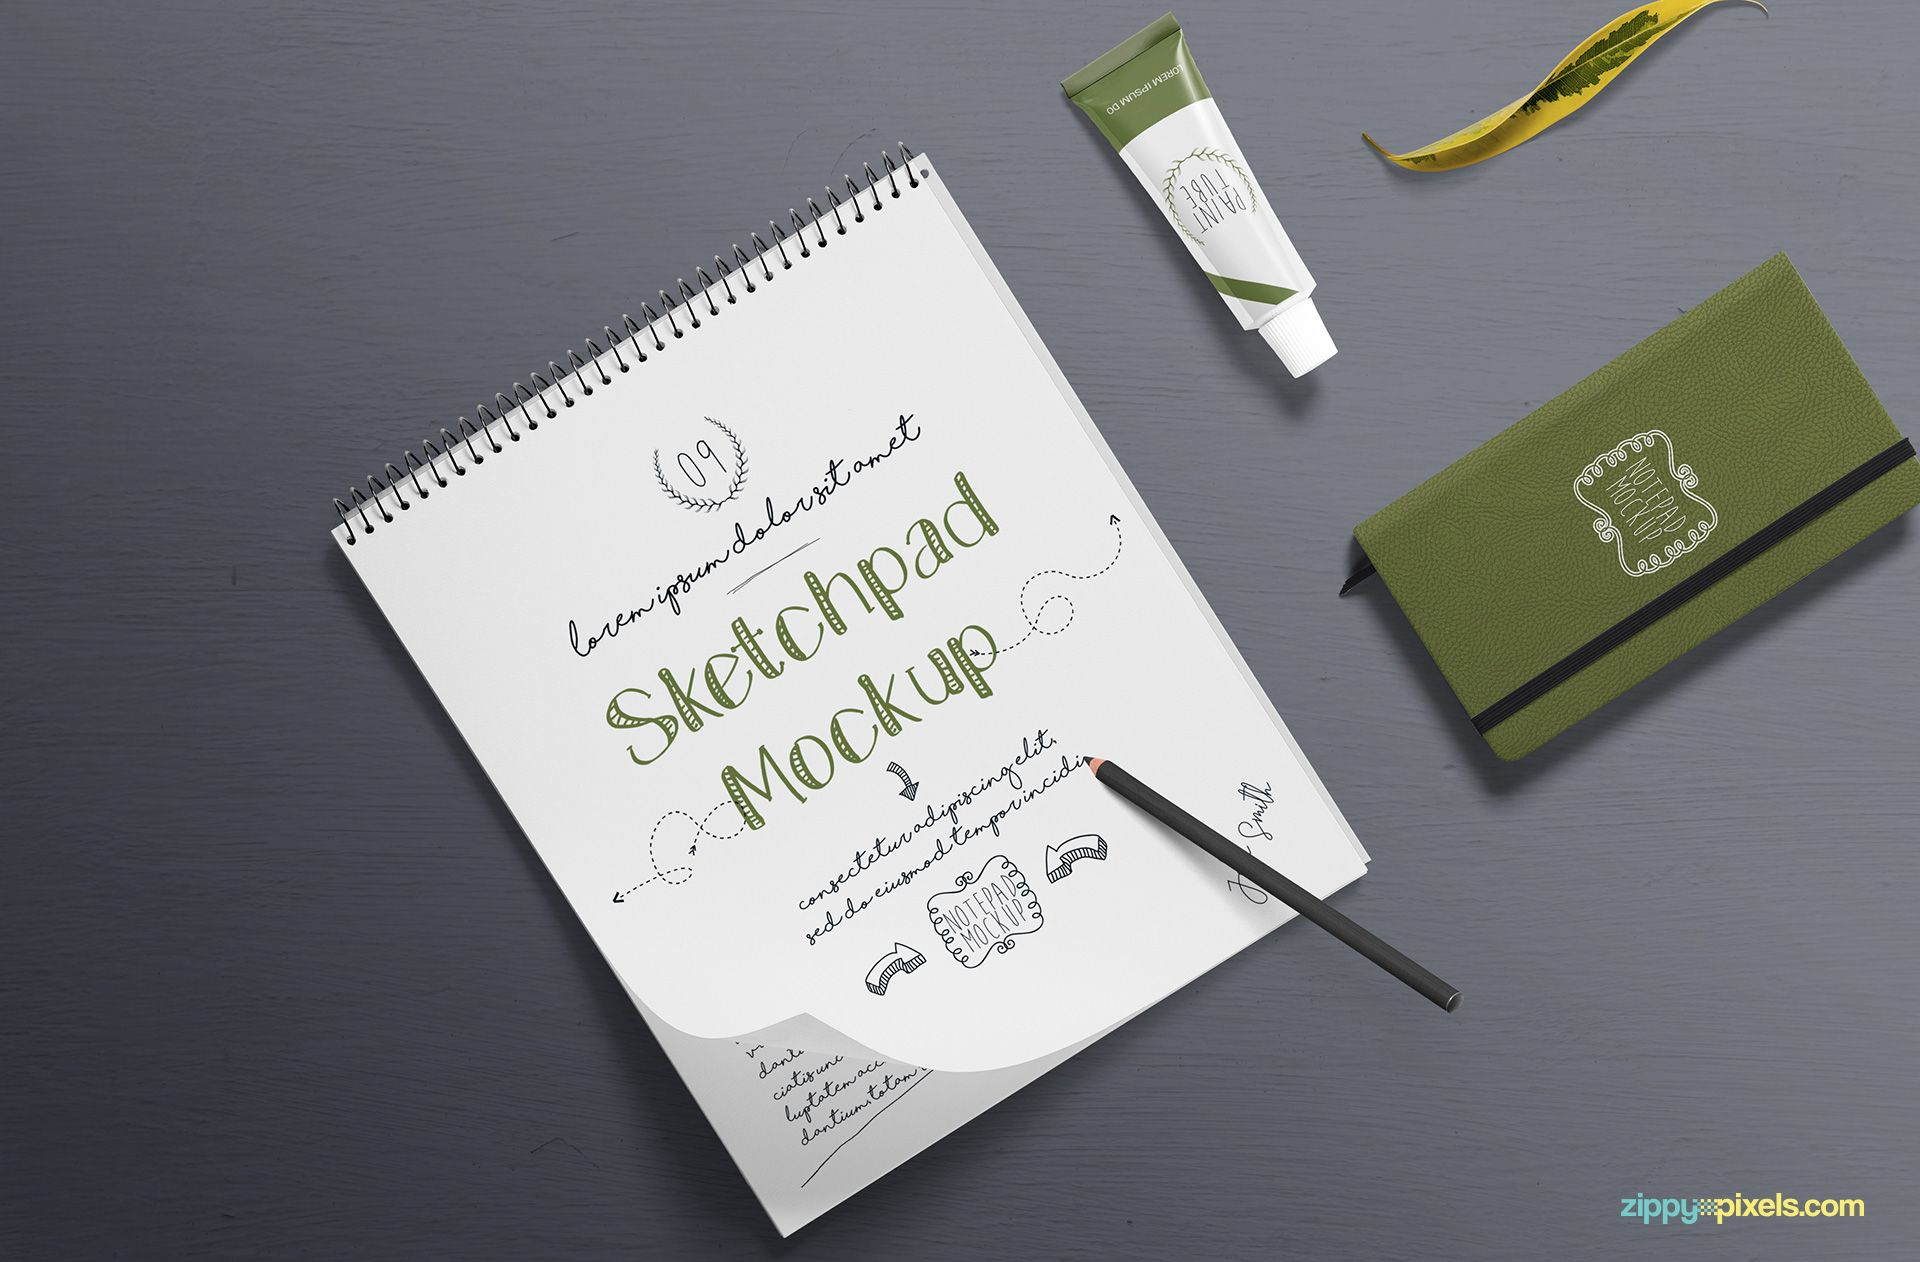 Free Realistic Sketchbook Mockup Zippypixels Stationery Mockup Free Design Elements Free Graphic Design